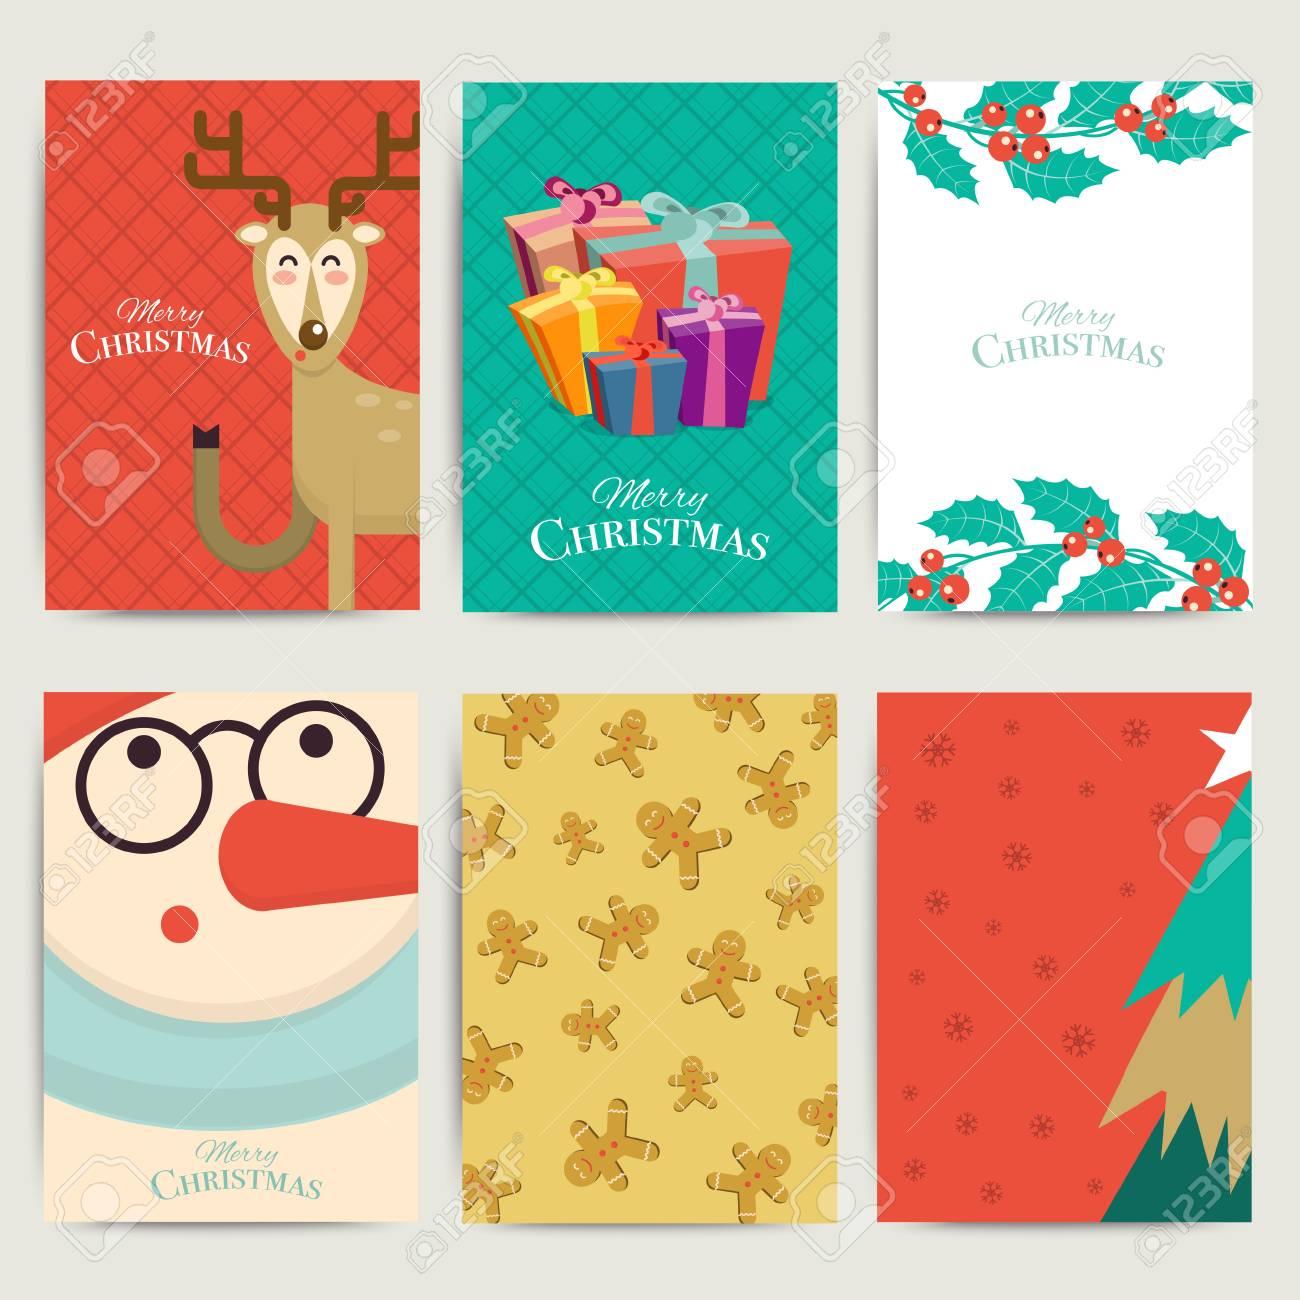 christmas greeting card templateset vector xmas invitation layout